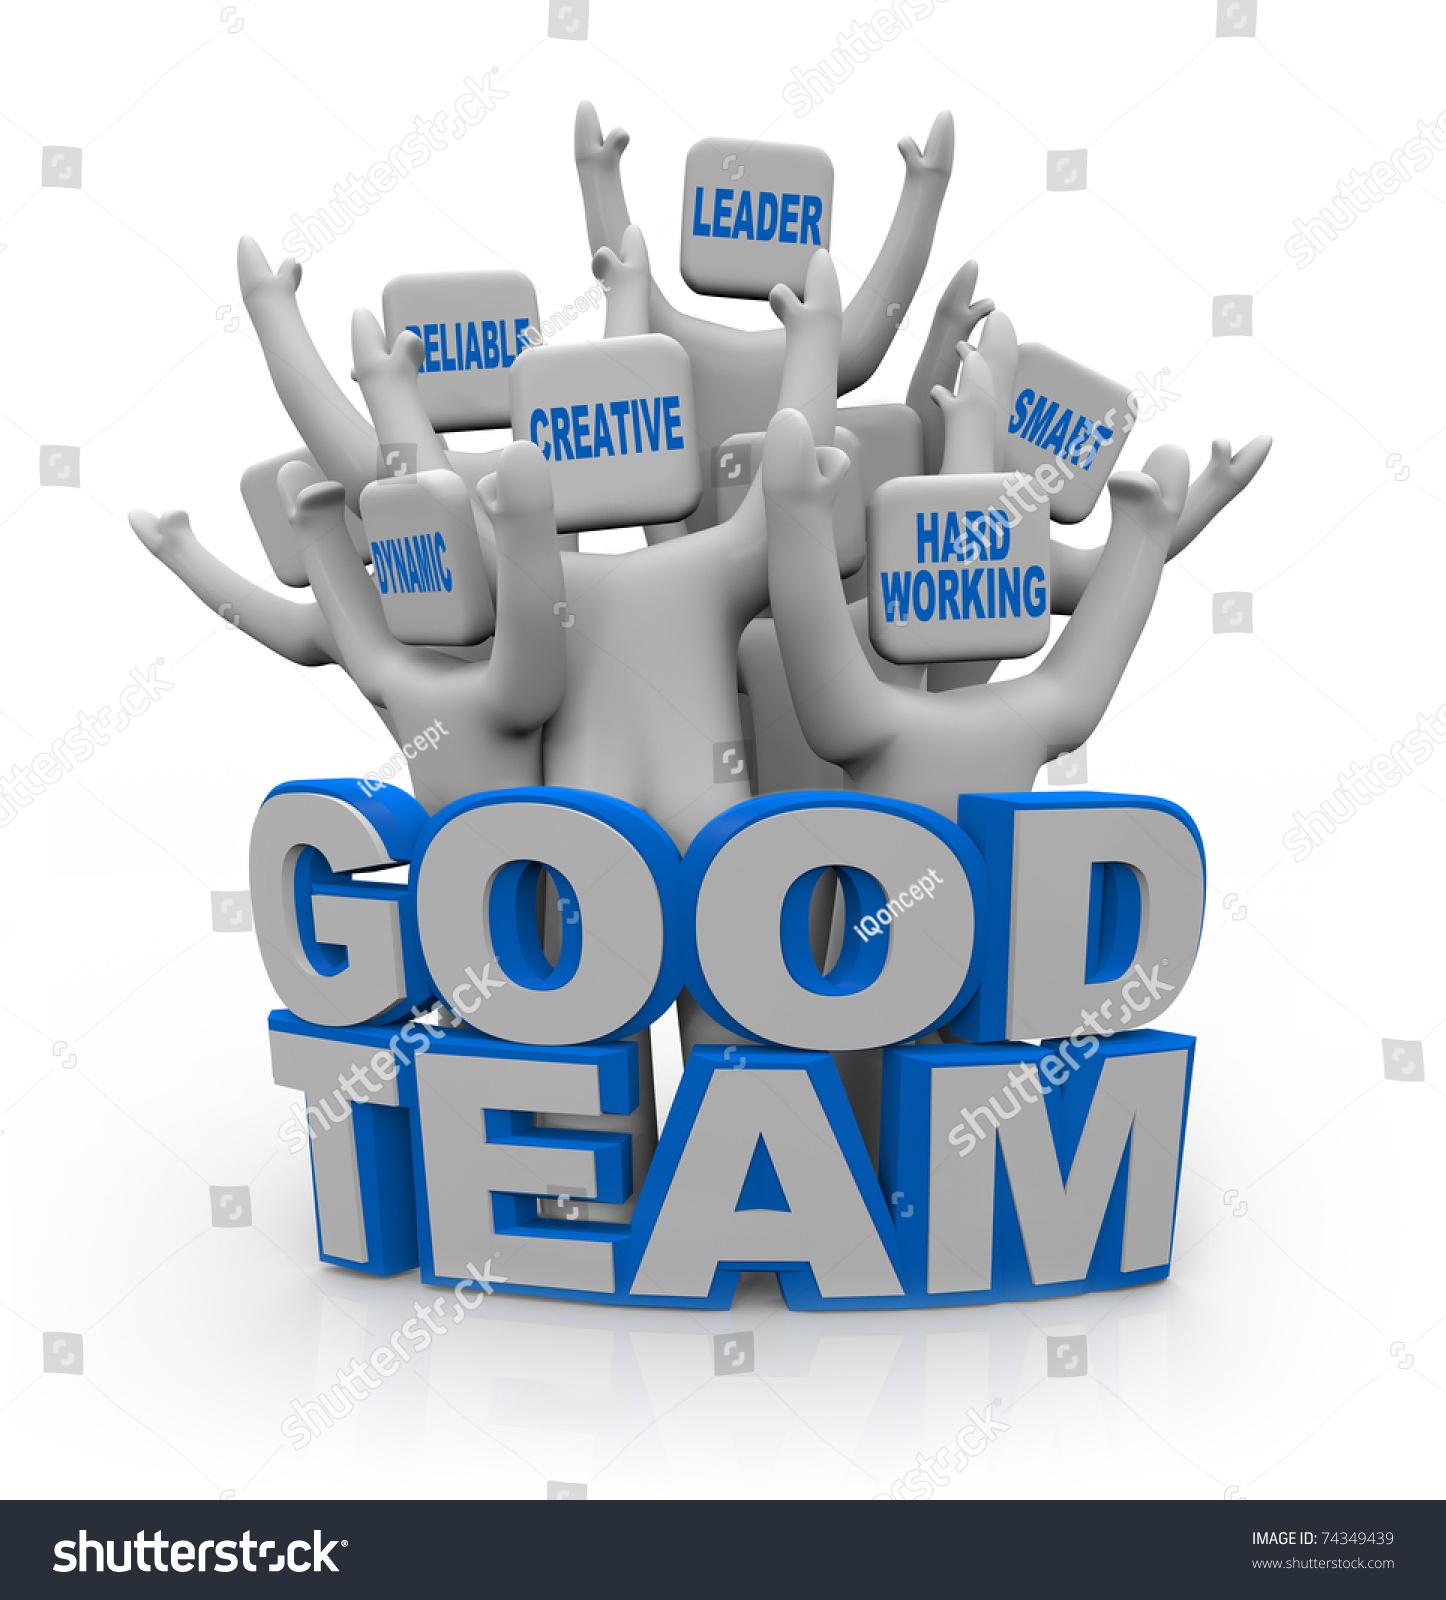 group cheering people teamwork qualities on stock illustration a group of cheering people teamwork qualities on their heads leader smart